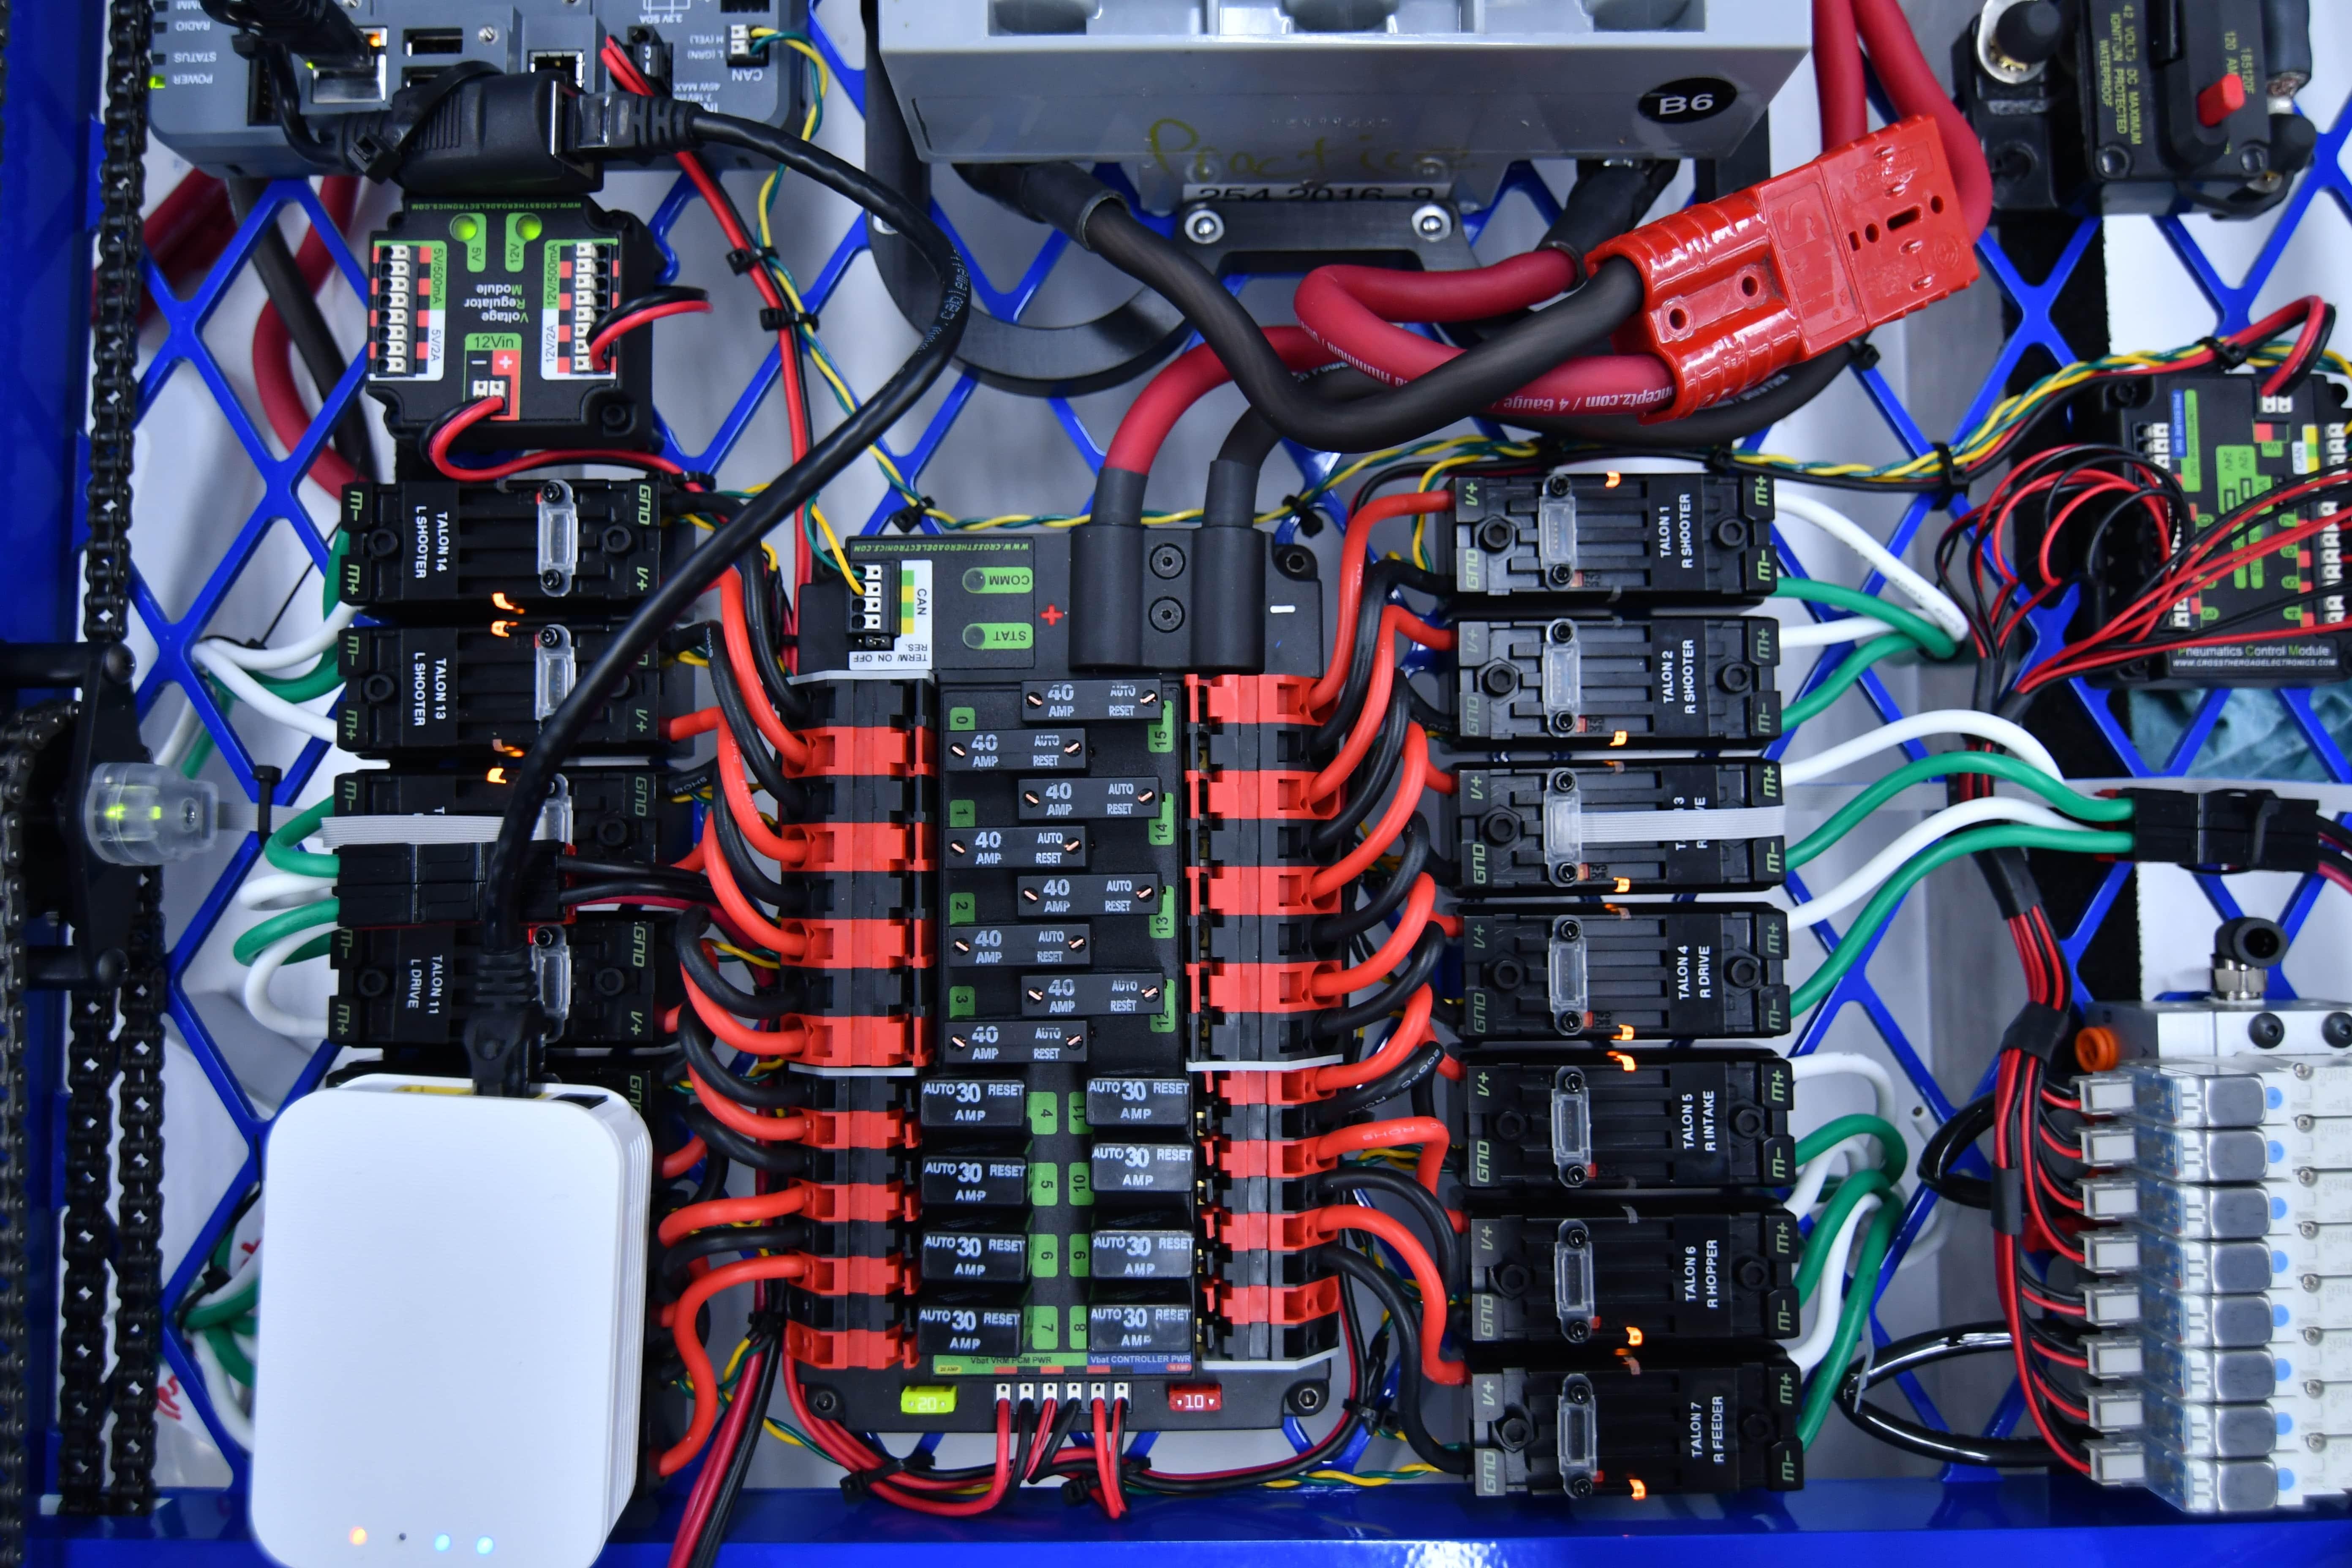 Frc Camera Wiring Diagrams Robotics Diagram 2018 Wire Center U2022 Power Supply